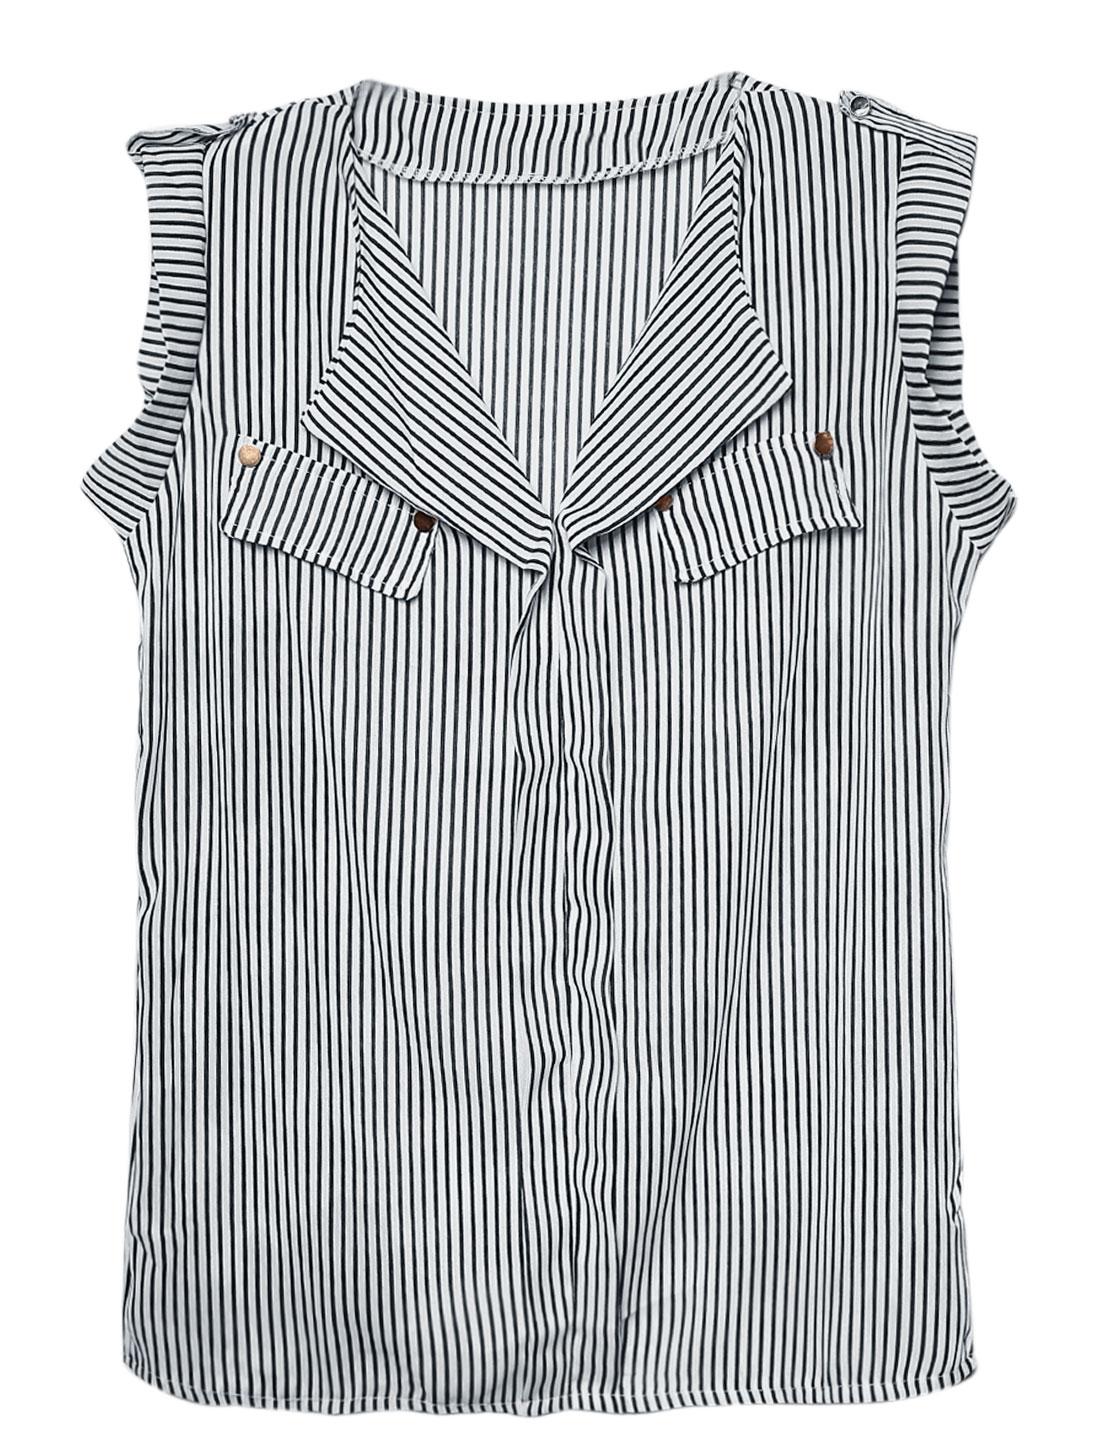 Lady Mock Bust Pocket Decor Sleeveless Stripes Chiffon Blouse Black White M